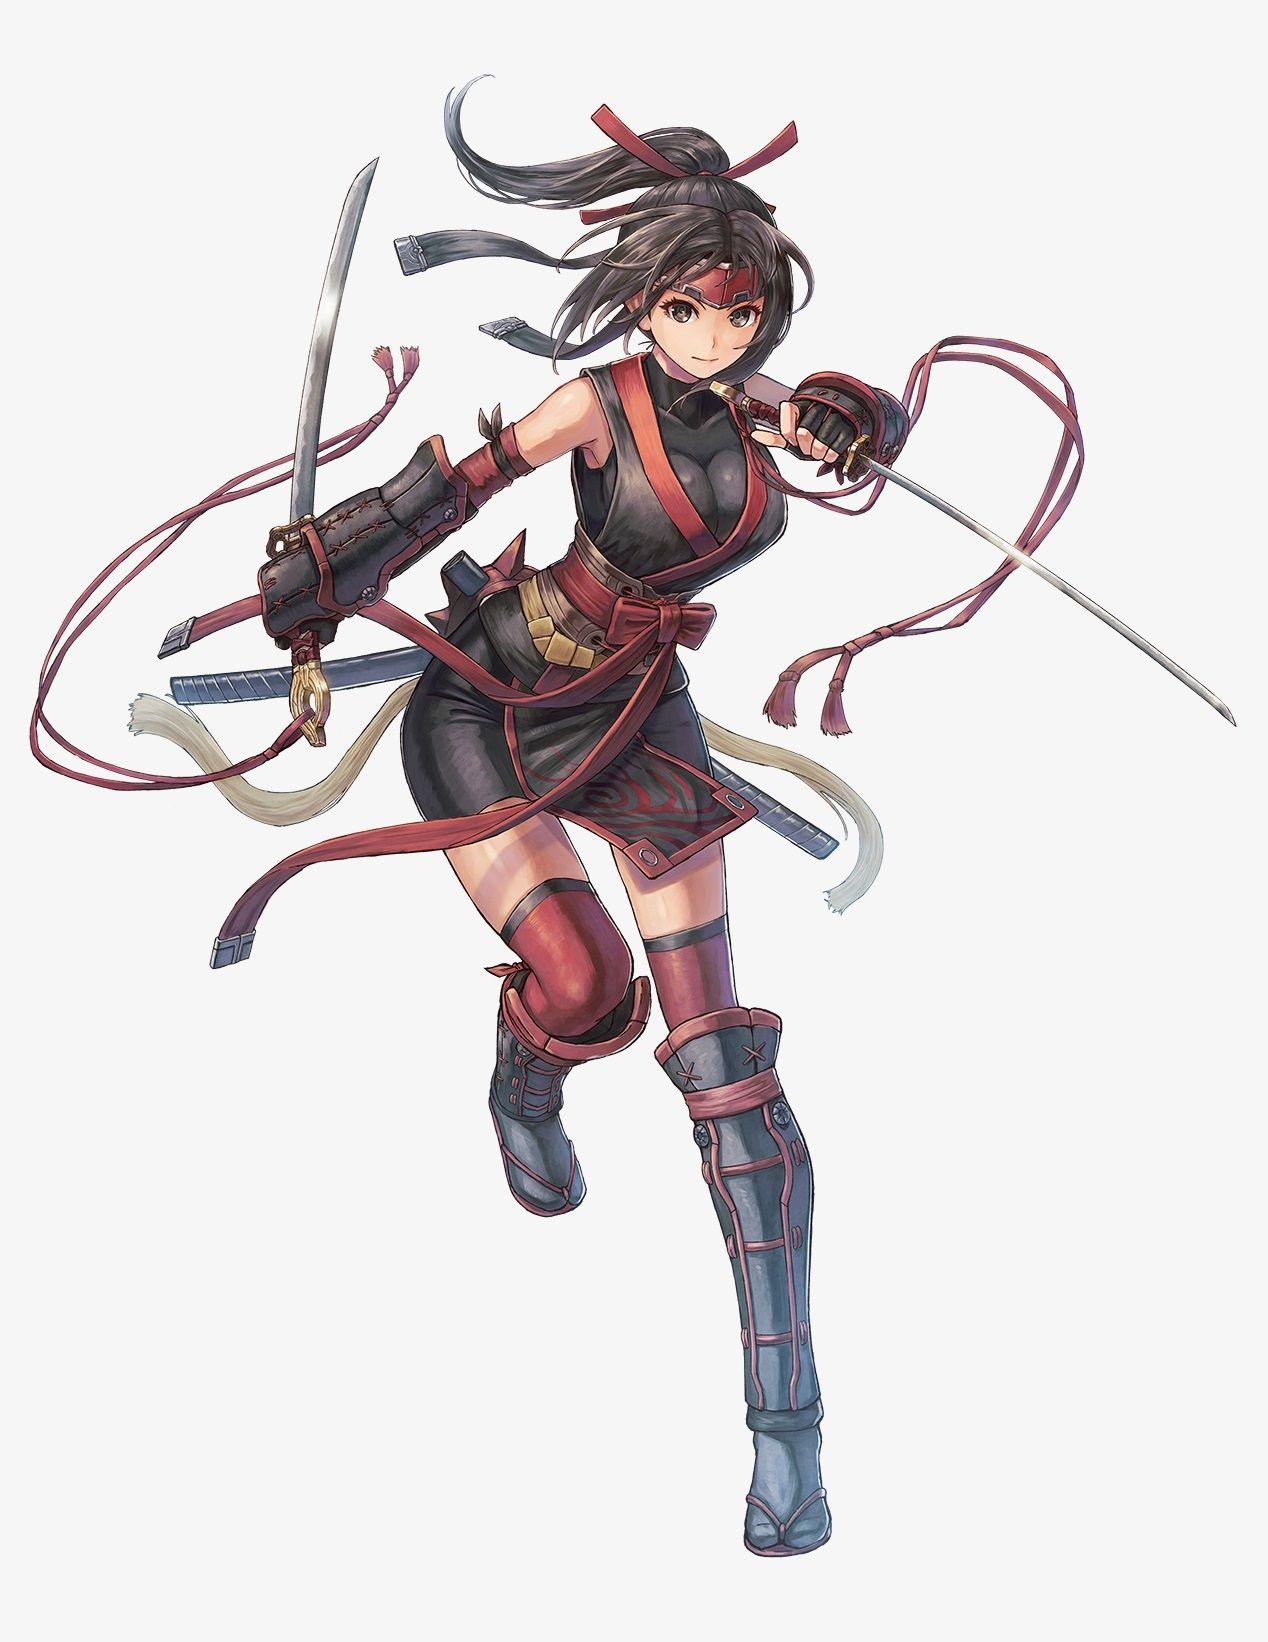 Pin By Peak Mason On Rpg Female Character 22 Female Ninja Female Character Concept Ninja Girl